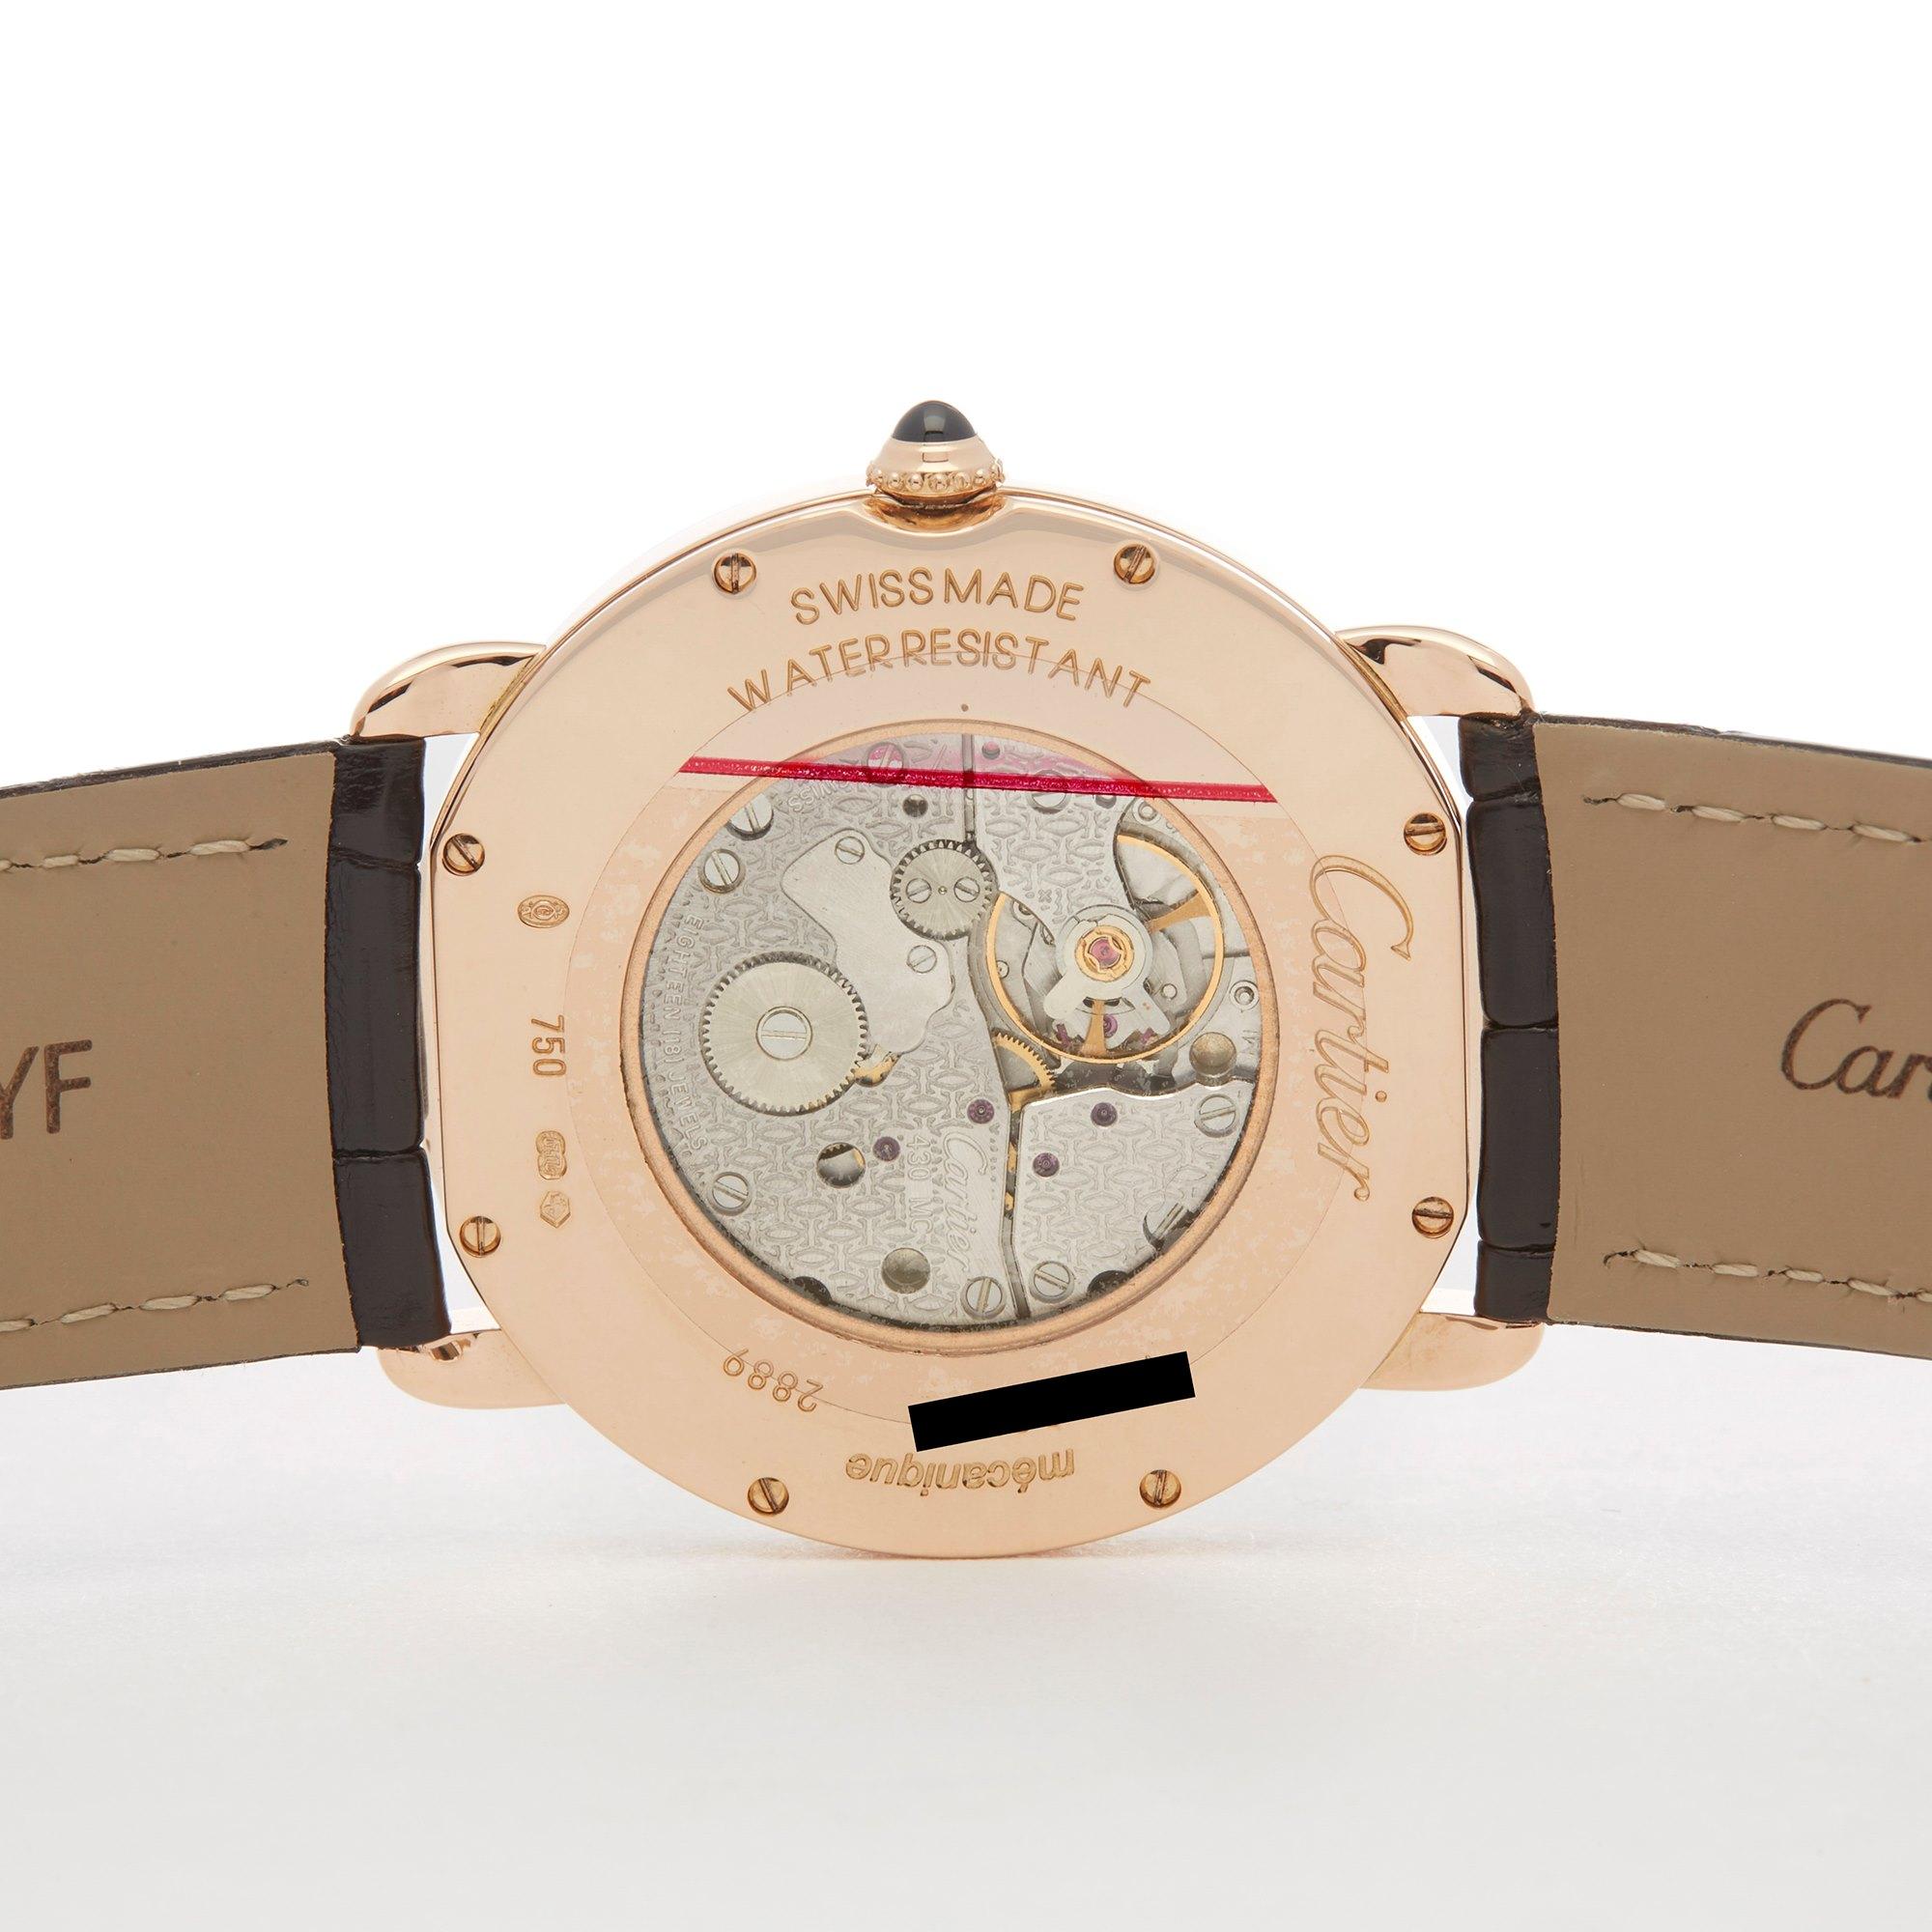 Cartier Ronde 18K Rose Gold 2889